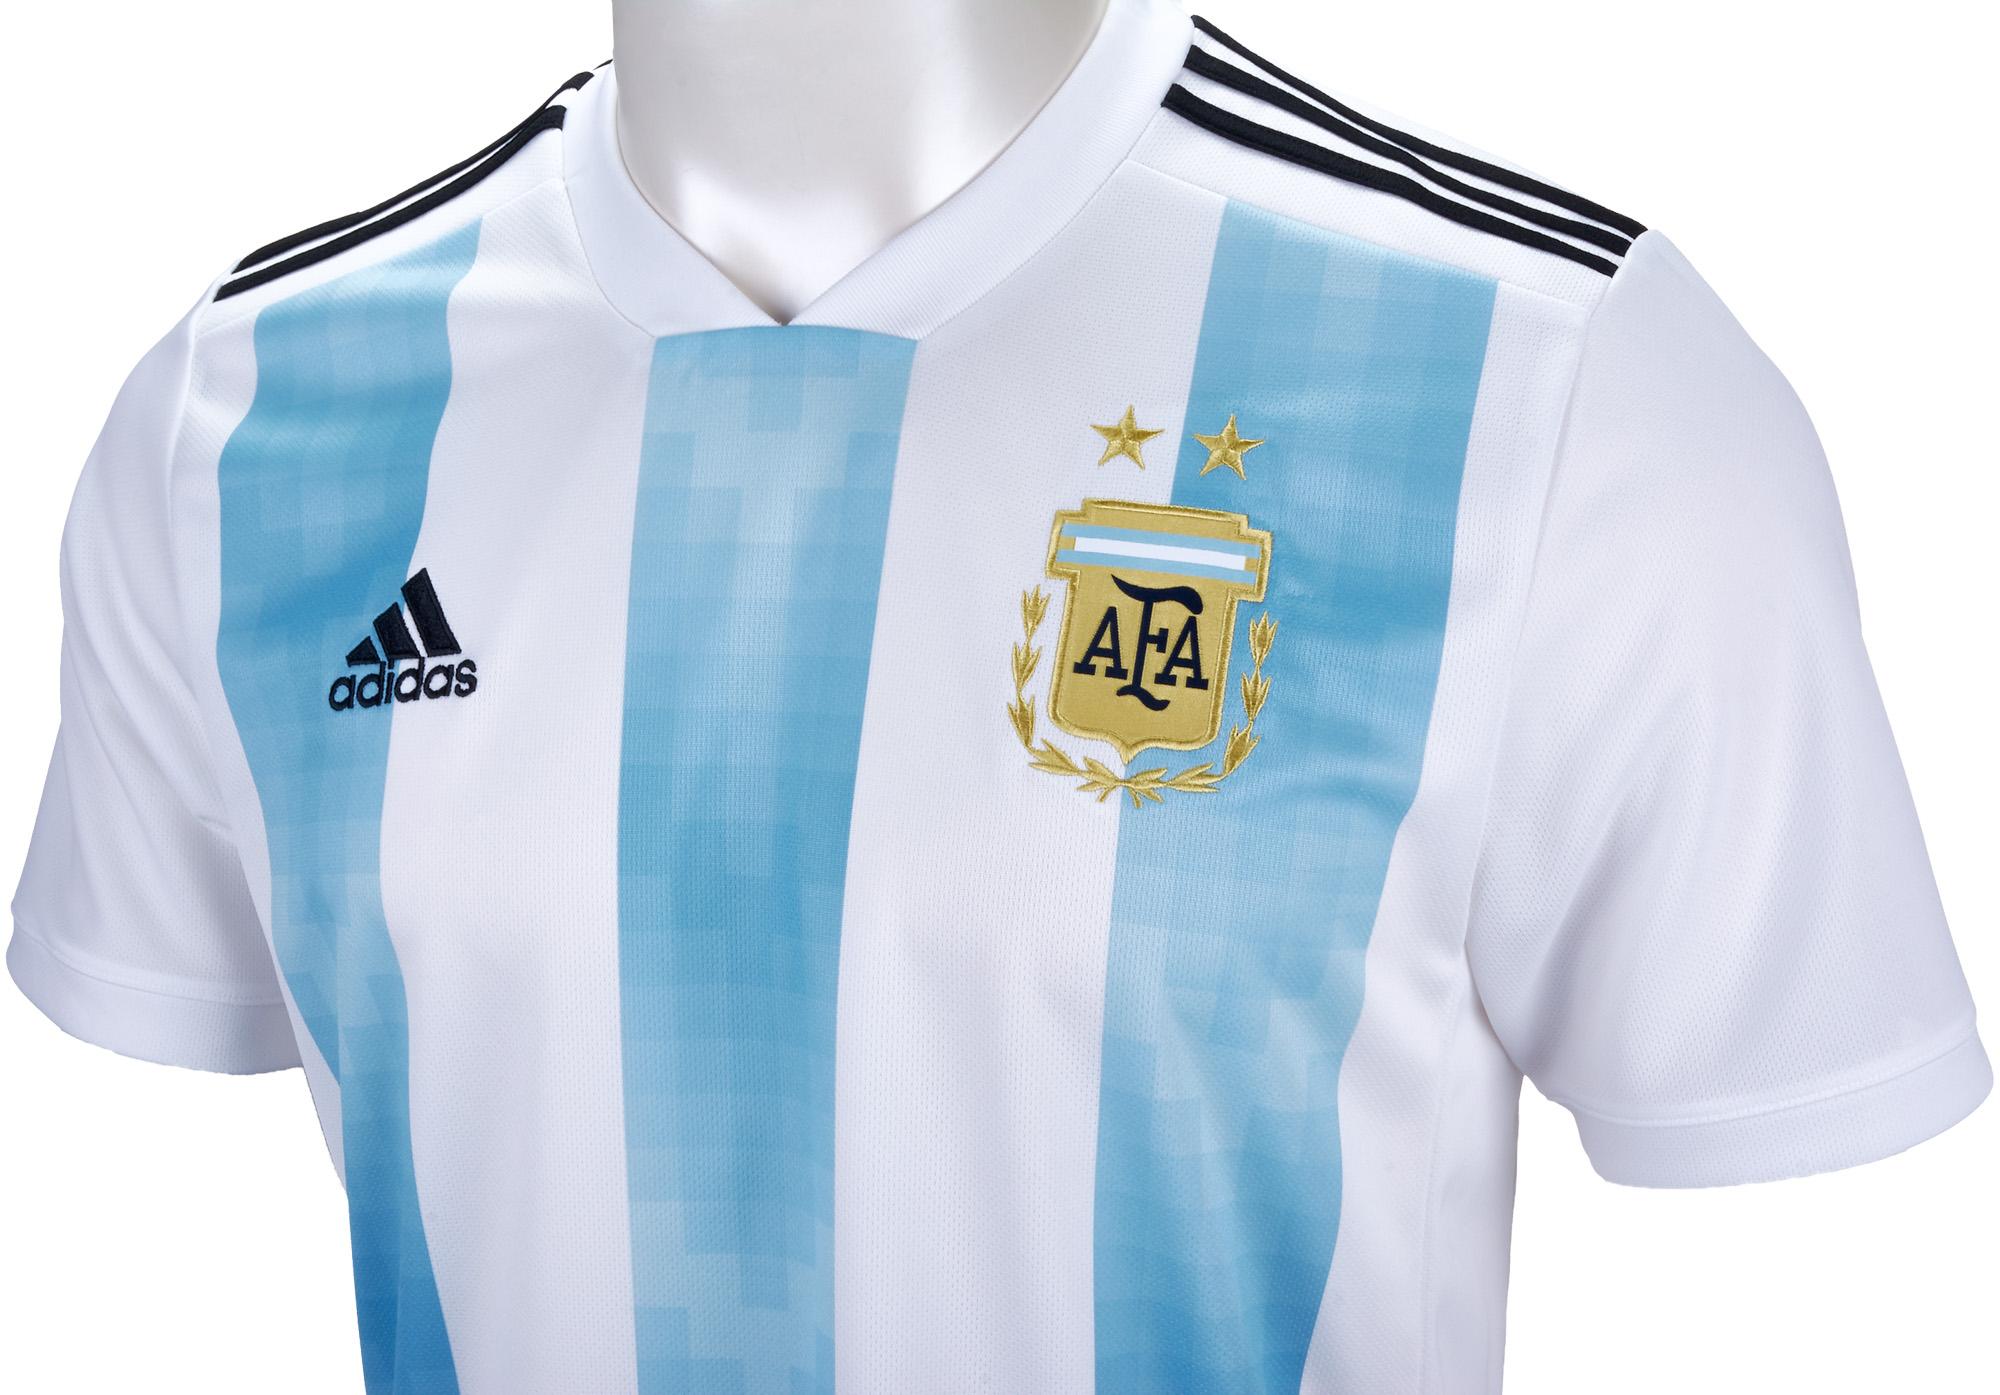 dicks argentina jersey